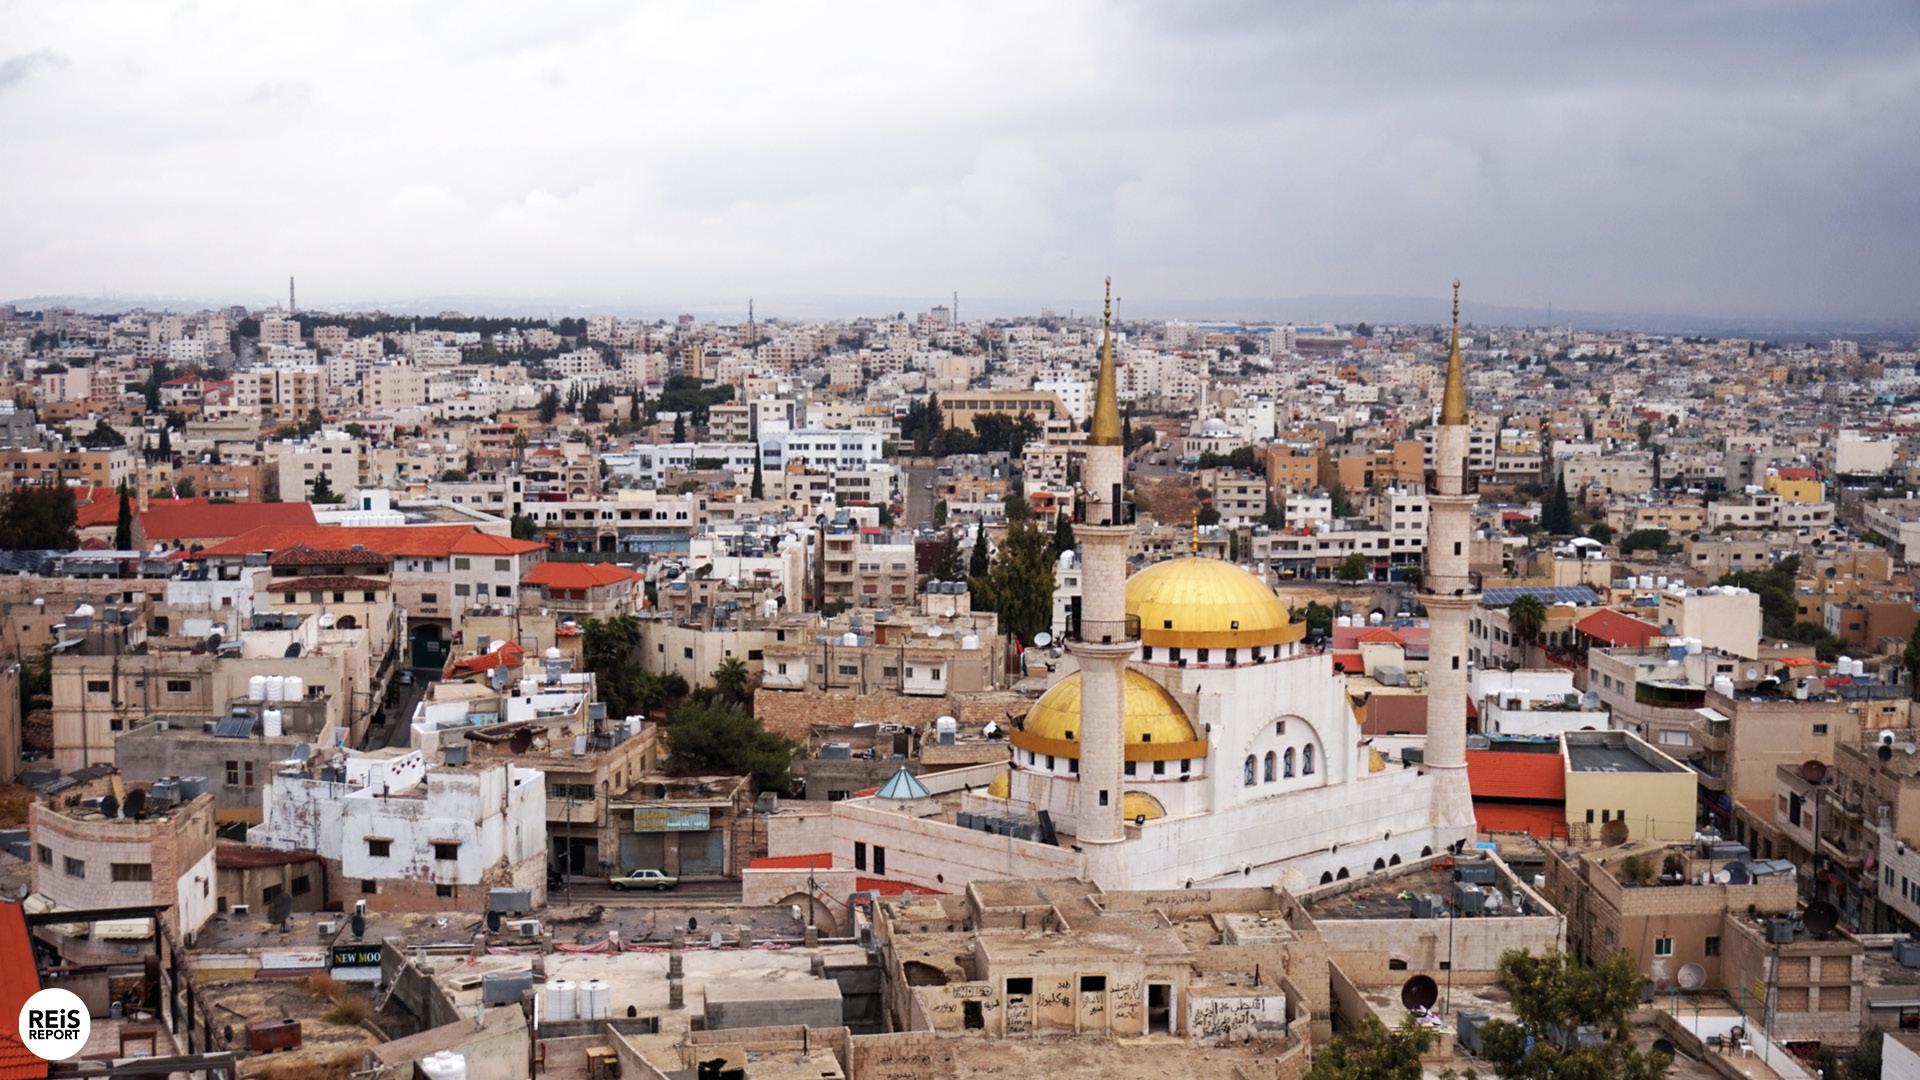 Day 3, Amman/ Madaba/ Mt. Nebo/ Baptism site/ Dead Sea picture